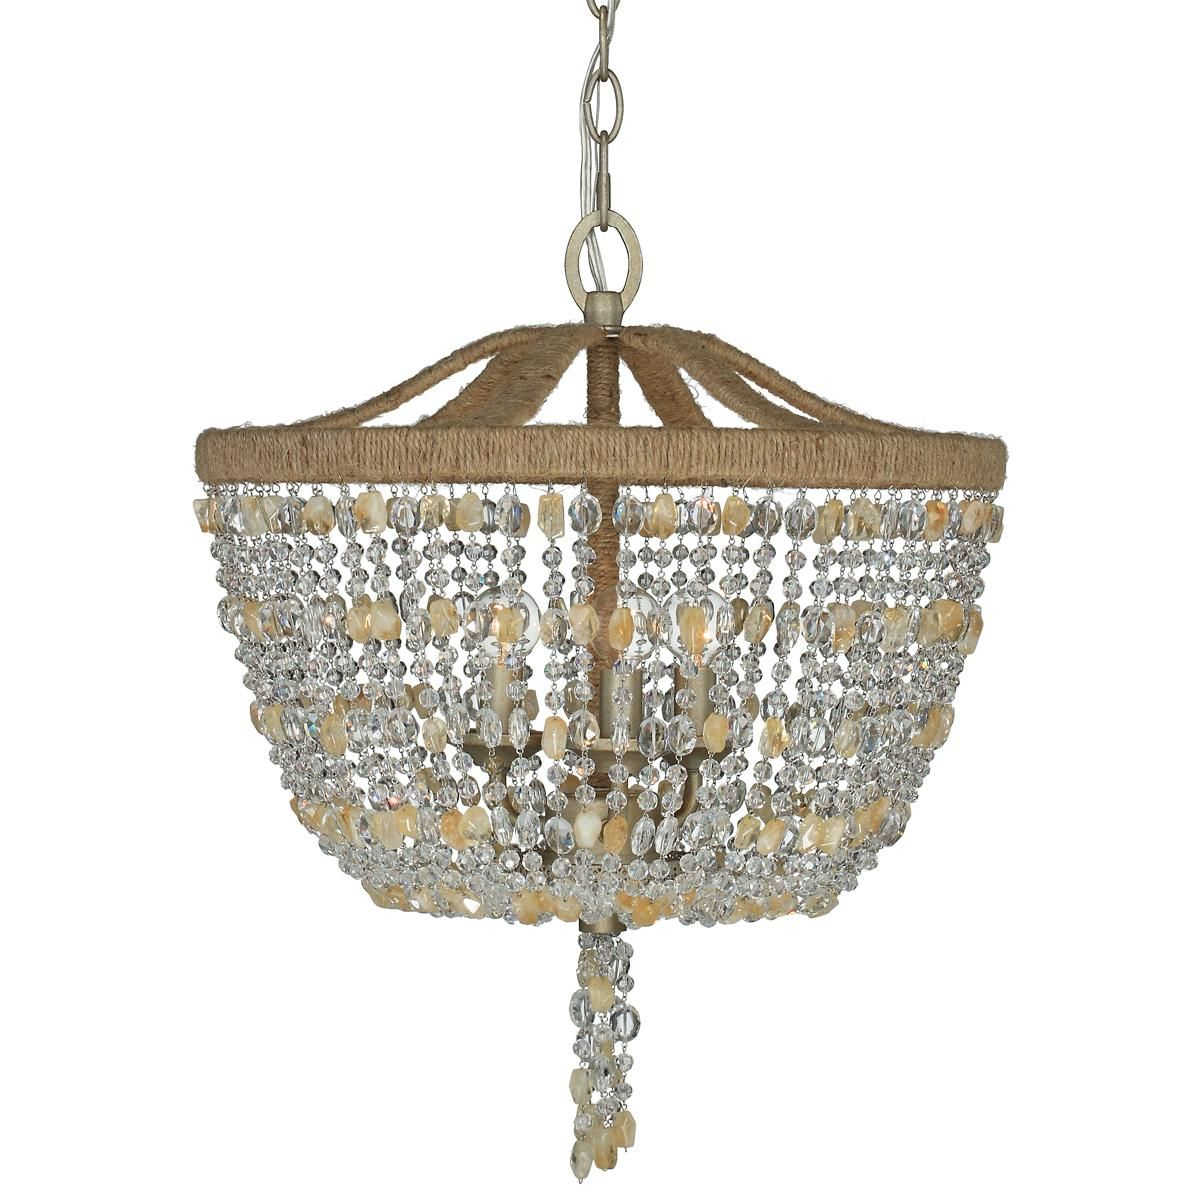 Rock crystal basket and jute frame mini chandelier ideas for